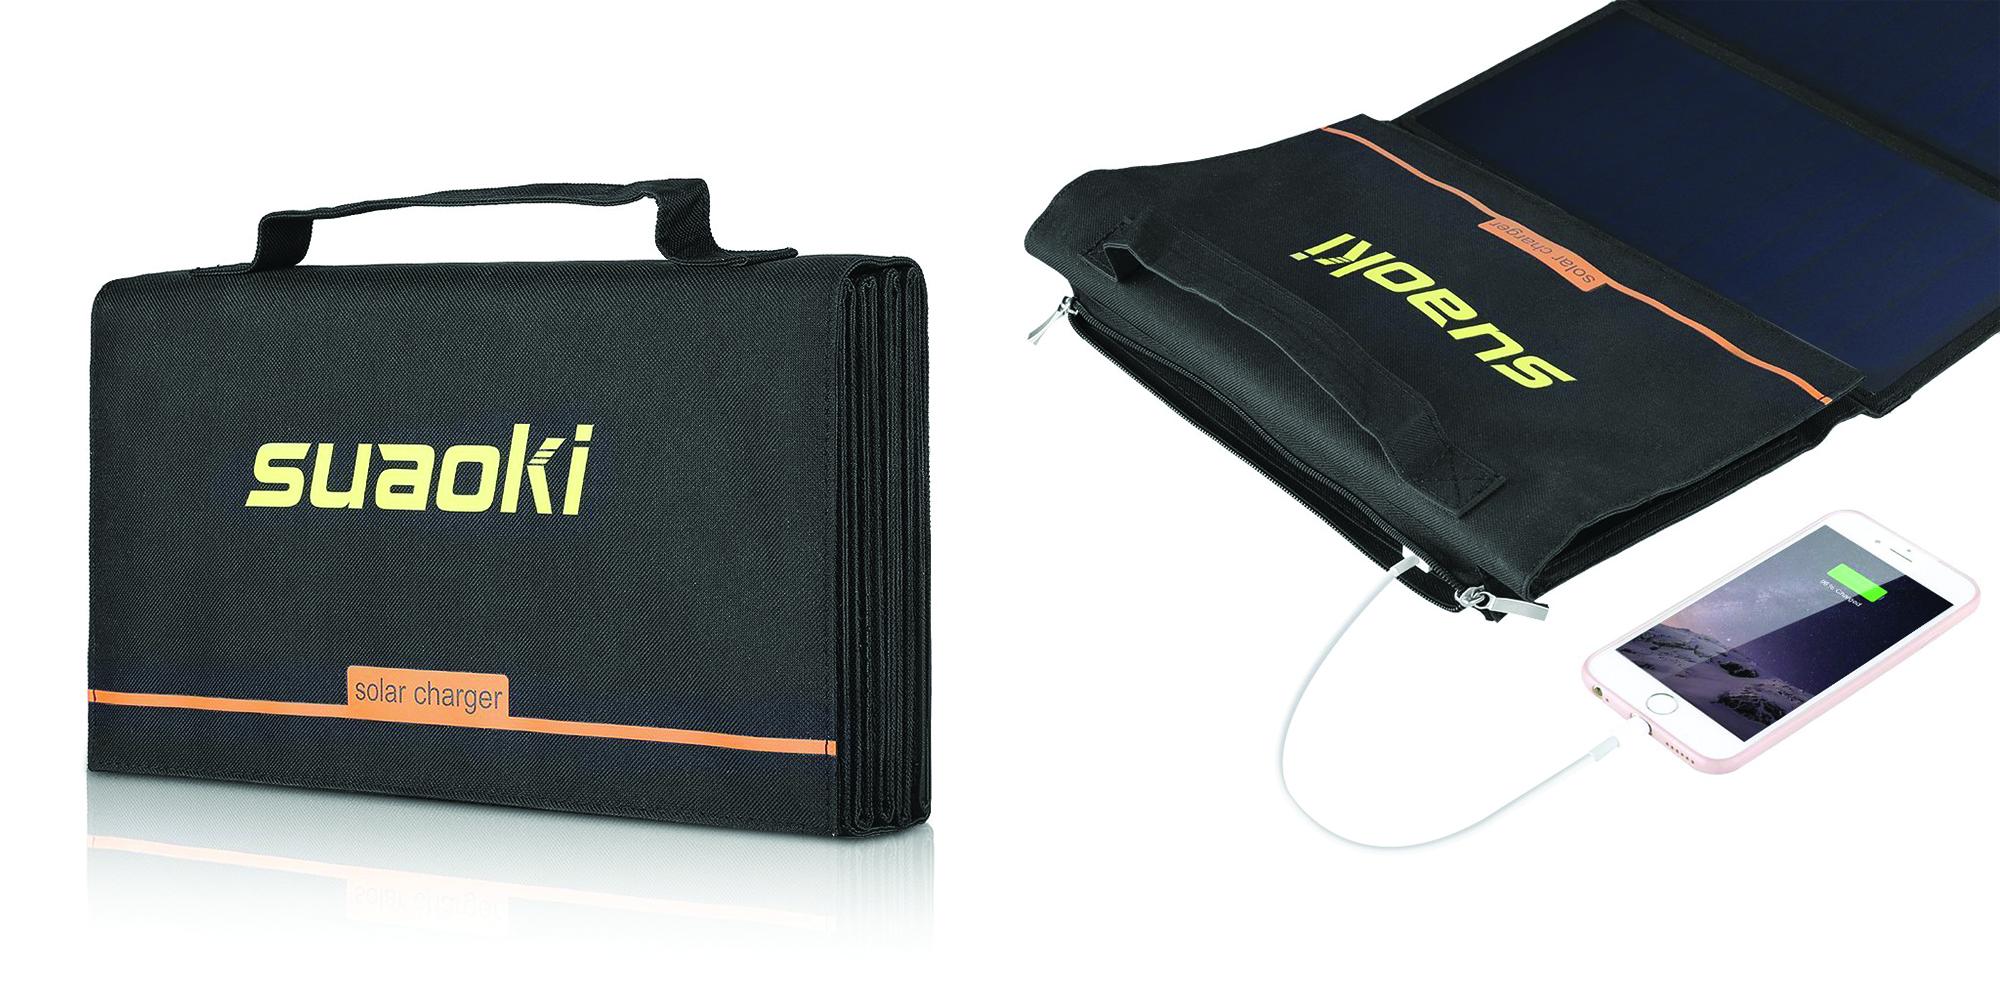 suaoki-solar-panel-charger